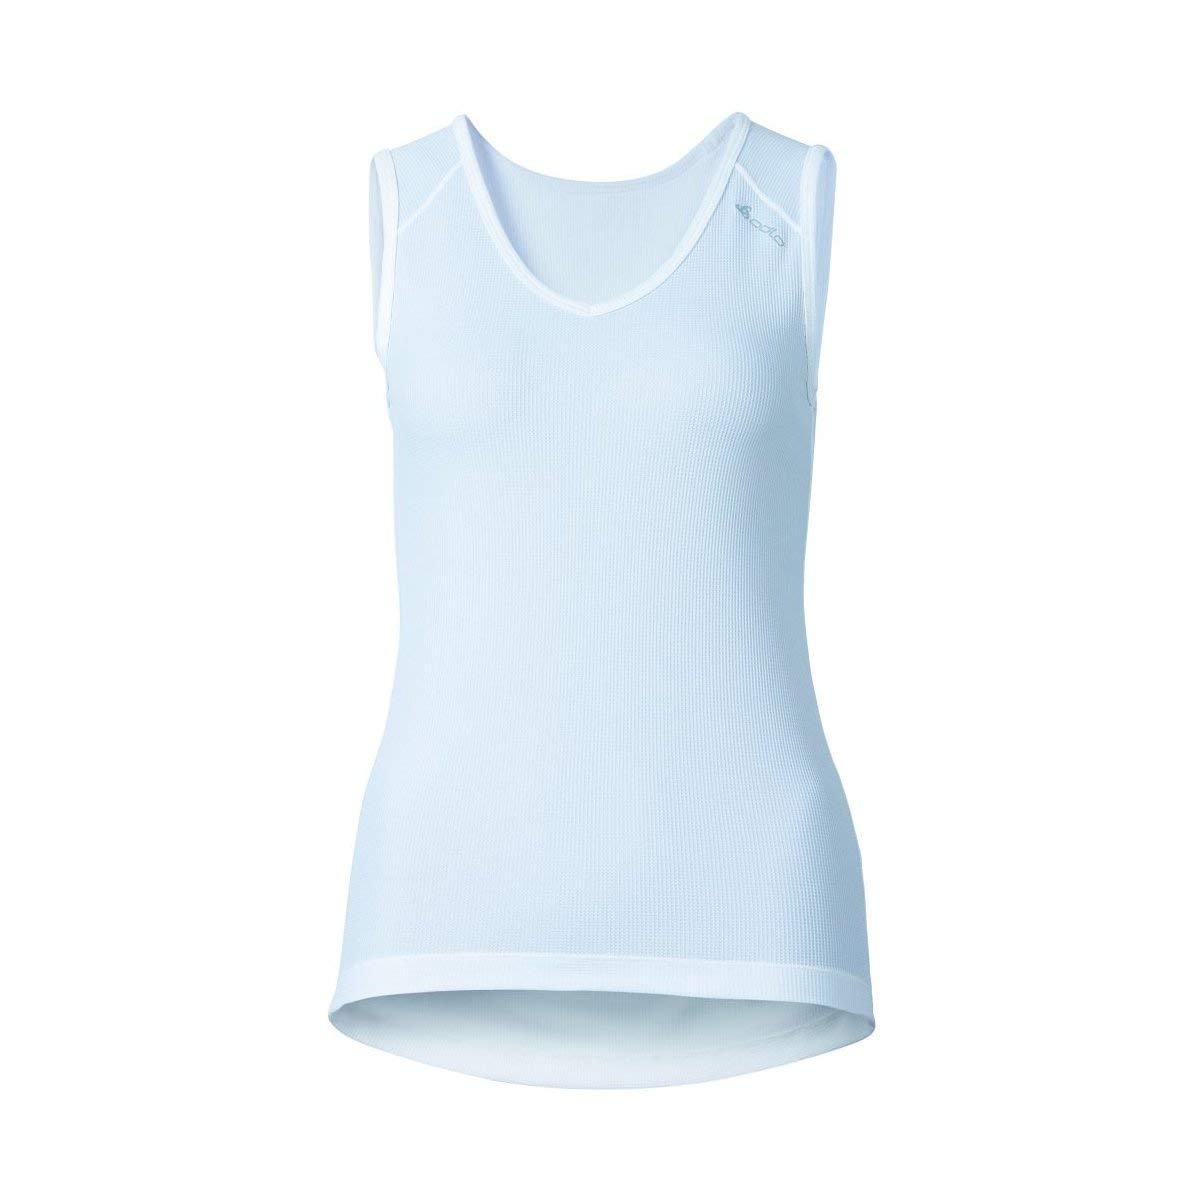 TALLA XX-Small. OdloCubic -Camiseta para Mujer, Cuello de Pico, Camiseta Interior